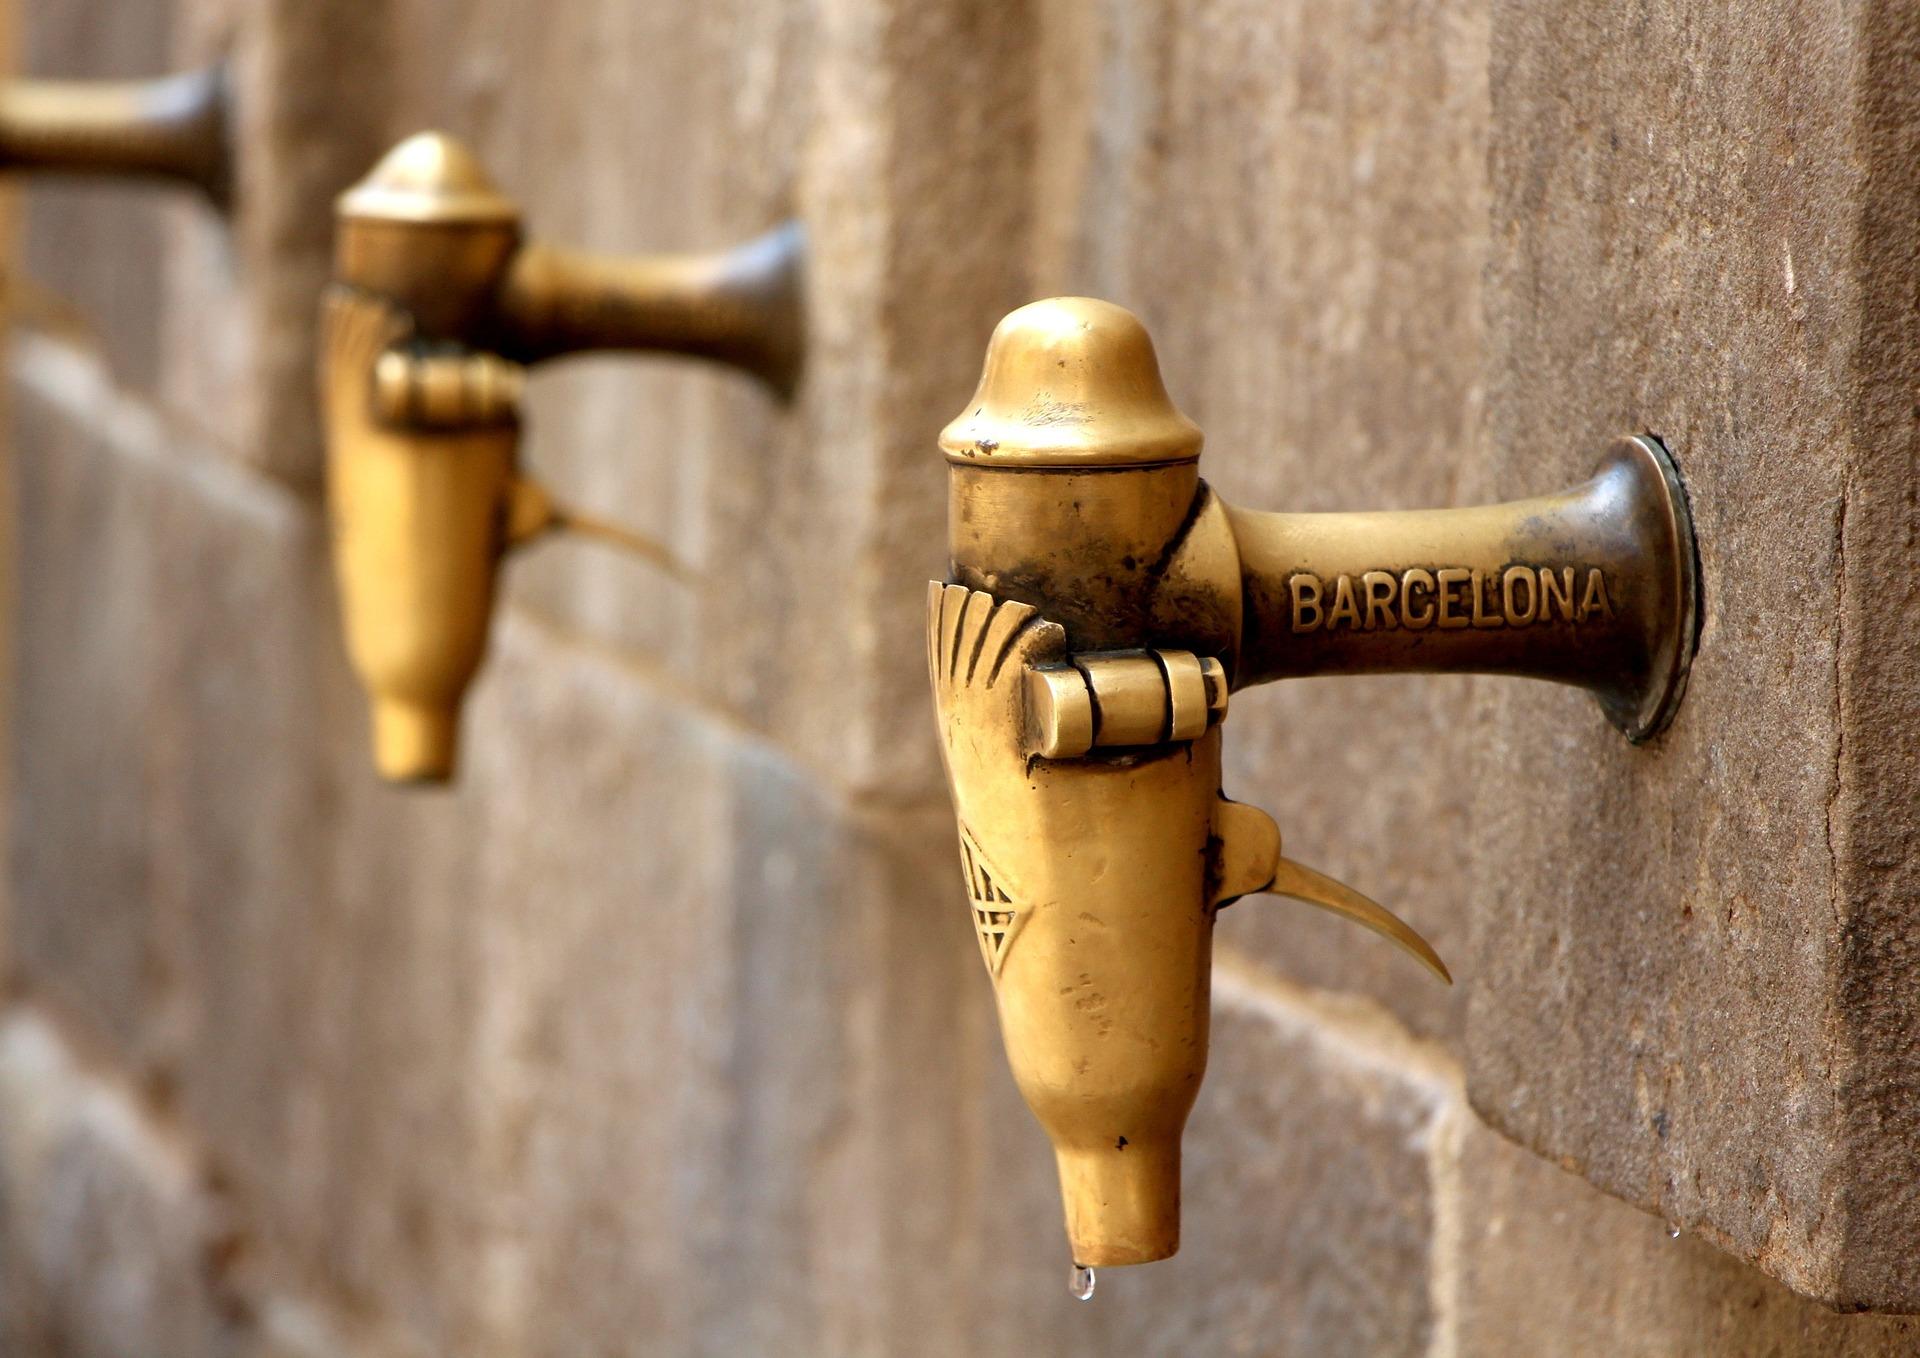 barcelona-953904_1920